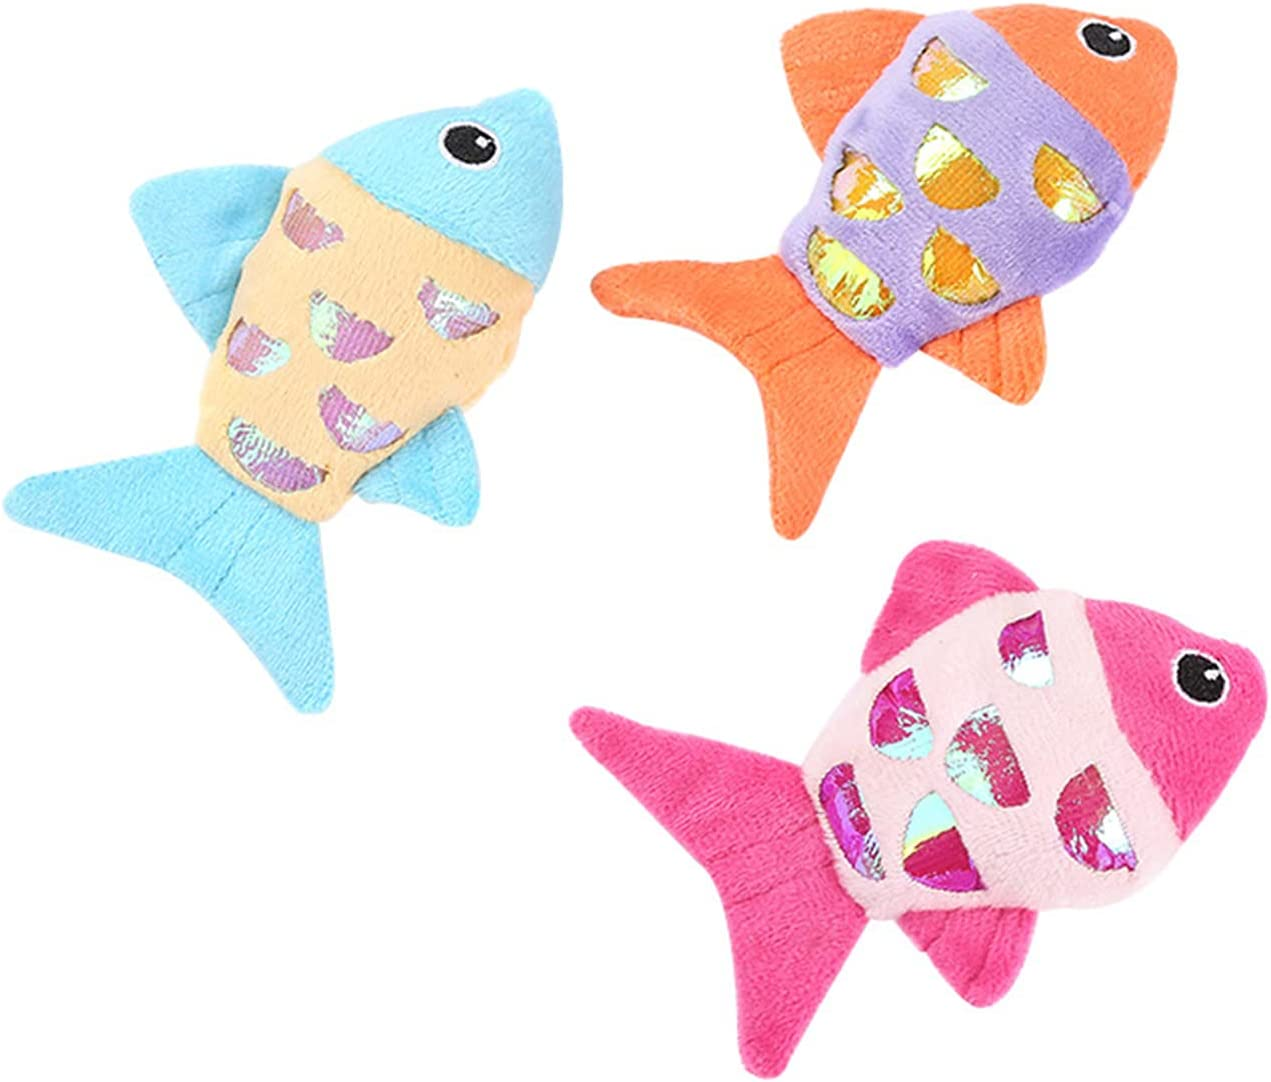 Haokaini 3pcs Ranking TOP15 Cat Toy Cartoon Fishes Bombing free shipping Catnip Toys Interactive